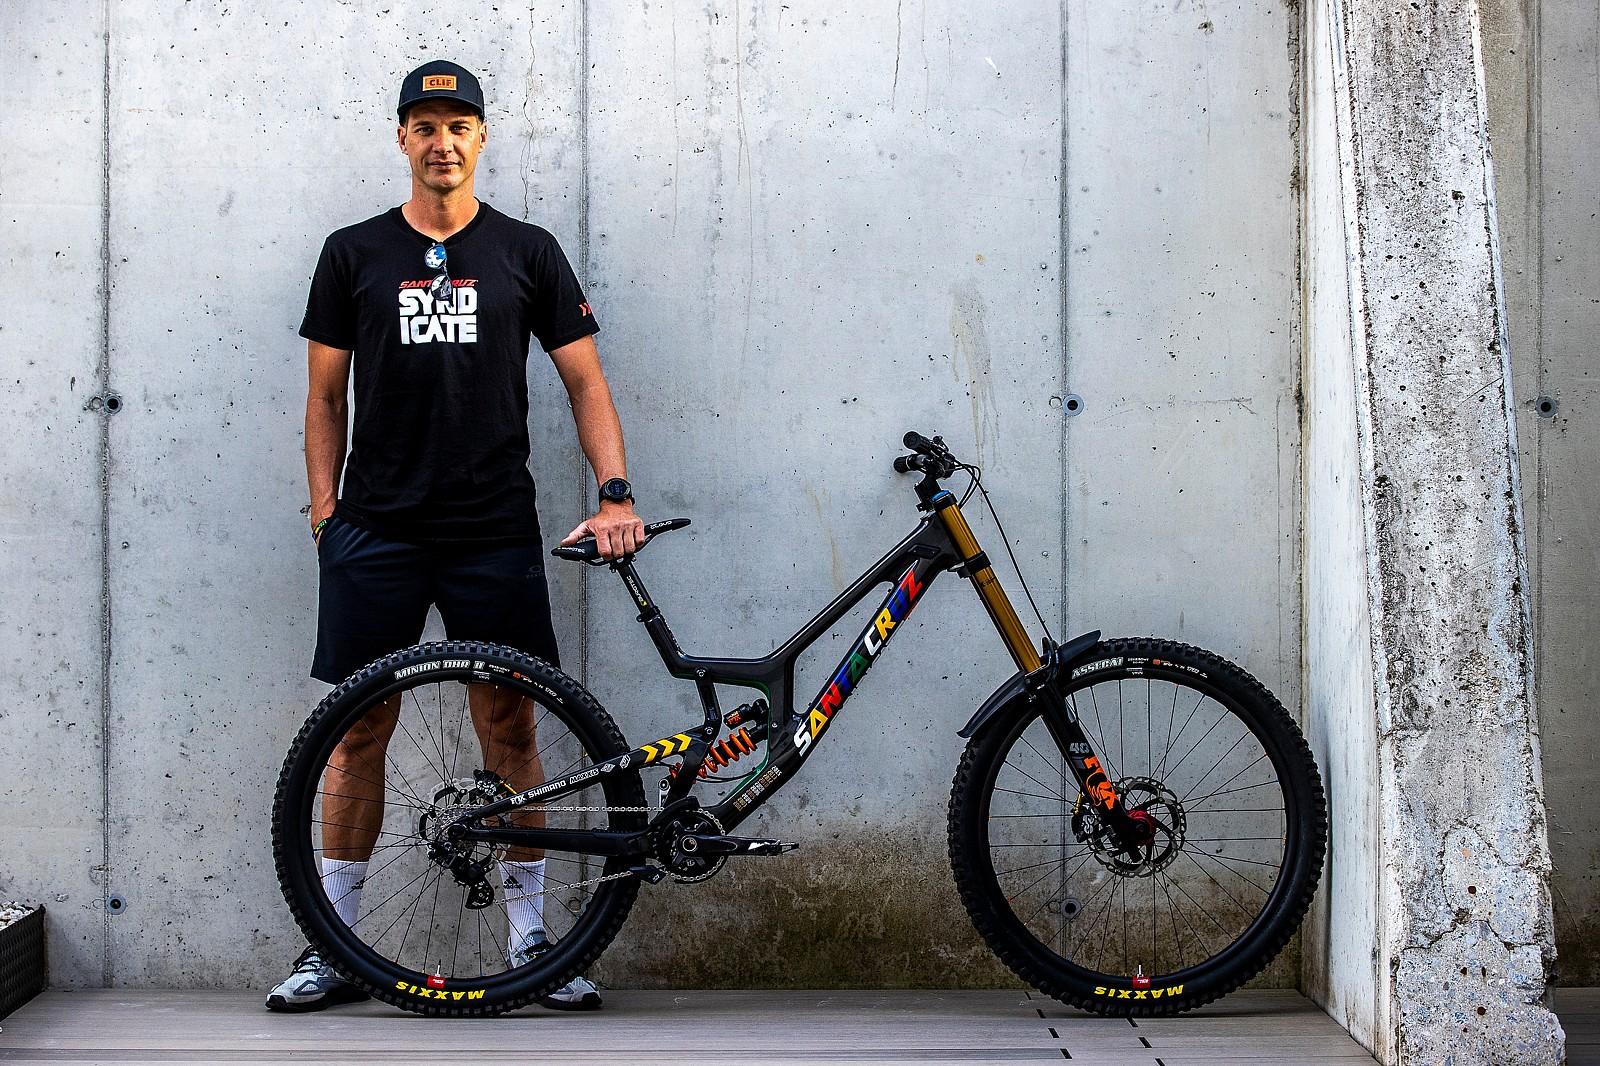 The GOAT and His Machine - WORLD CHAMPS BIKES - Santa Cruz Syndicate - Mountain Biking Pictures - Vital MTB